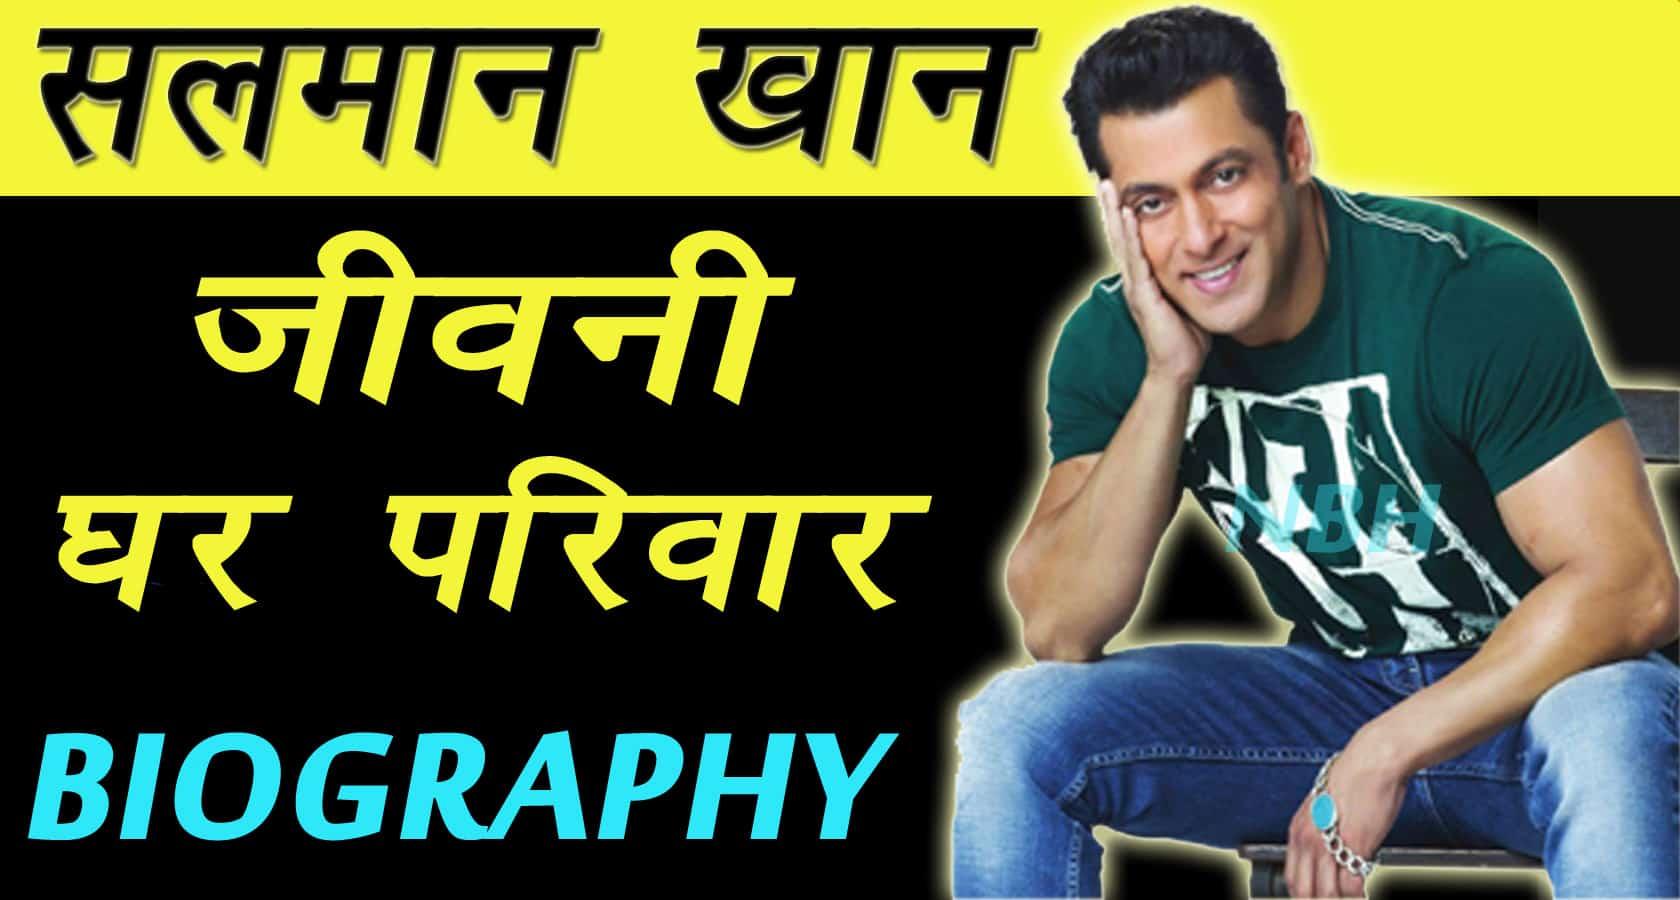 सलमान खान की जीवनी- Salman Khan Biography in Hindi